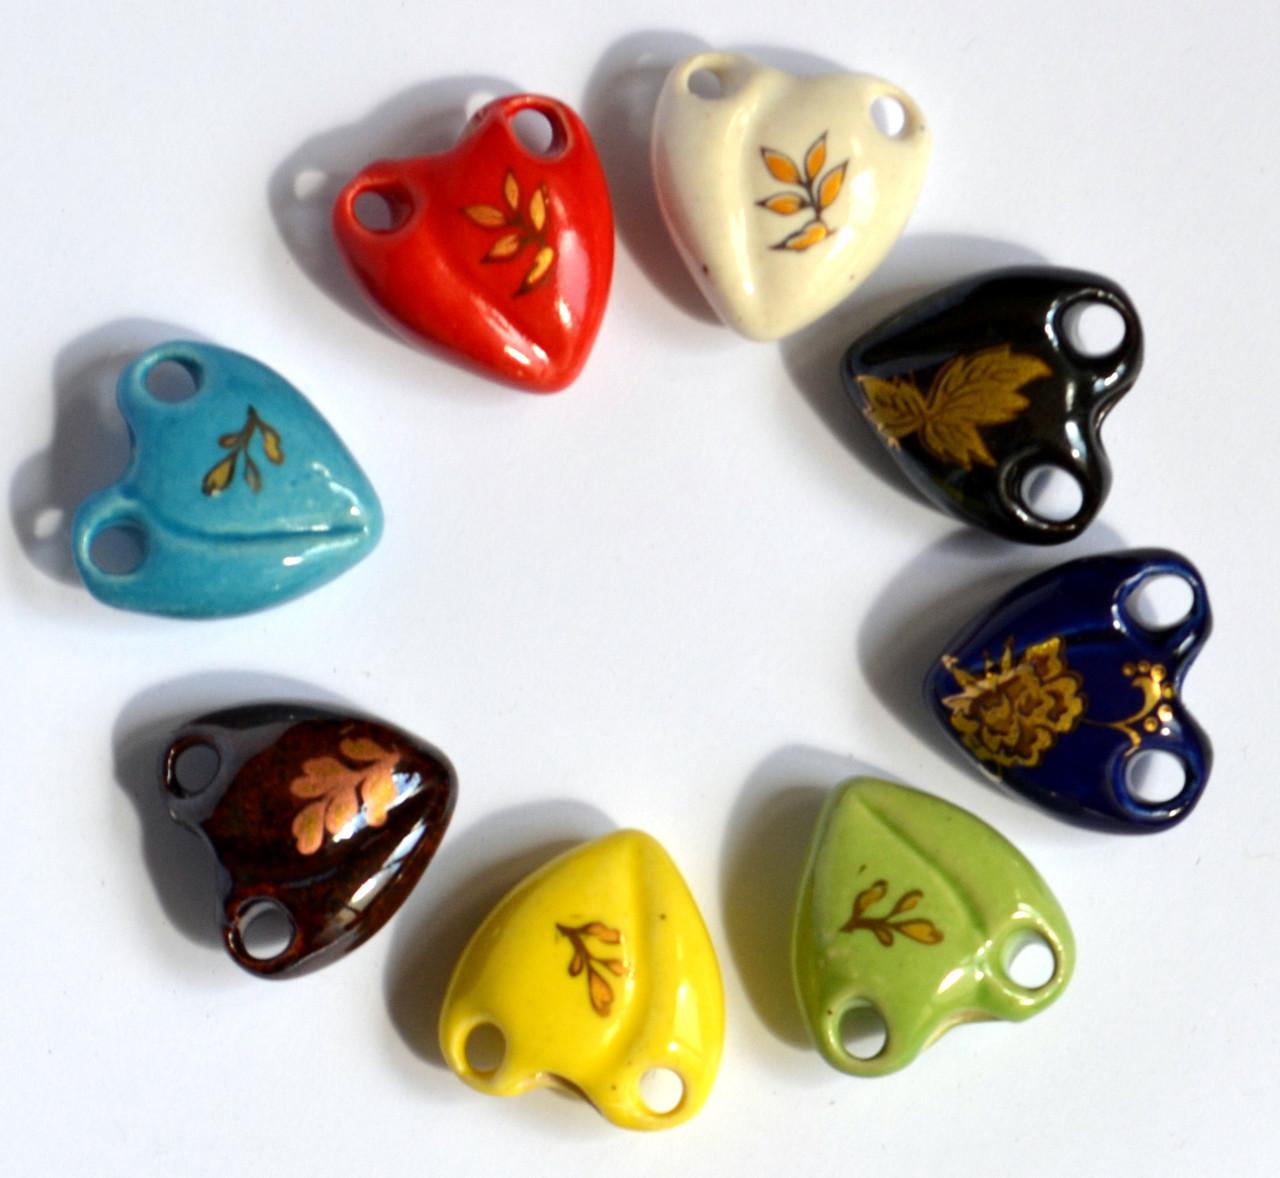 Аромакулон / Аромамедальон, сердечко, на кожаном шнурке, керамический